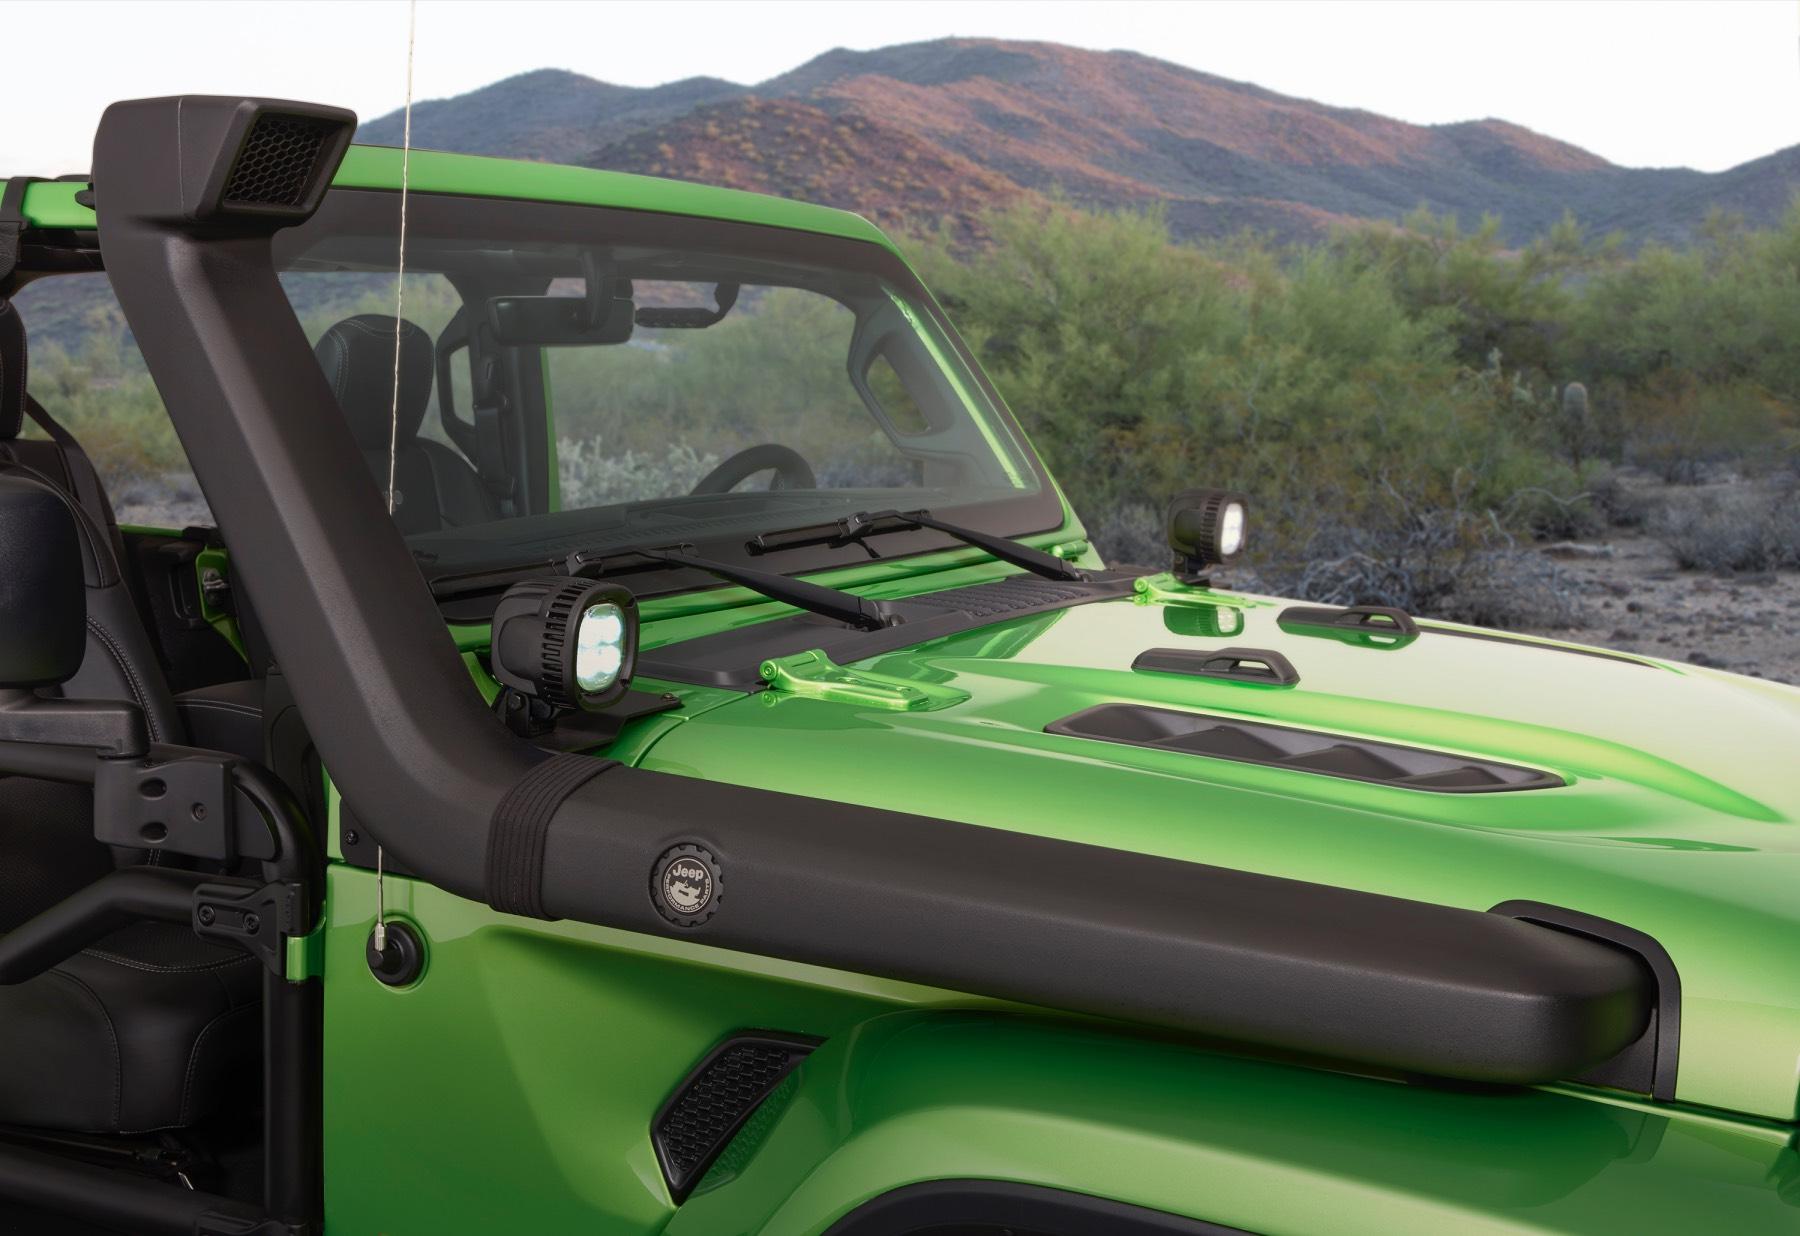 Jeep Wrangler JL Unlimited Rubicon Mopar